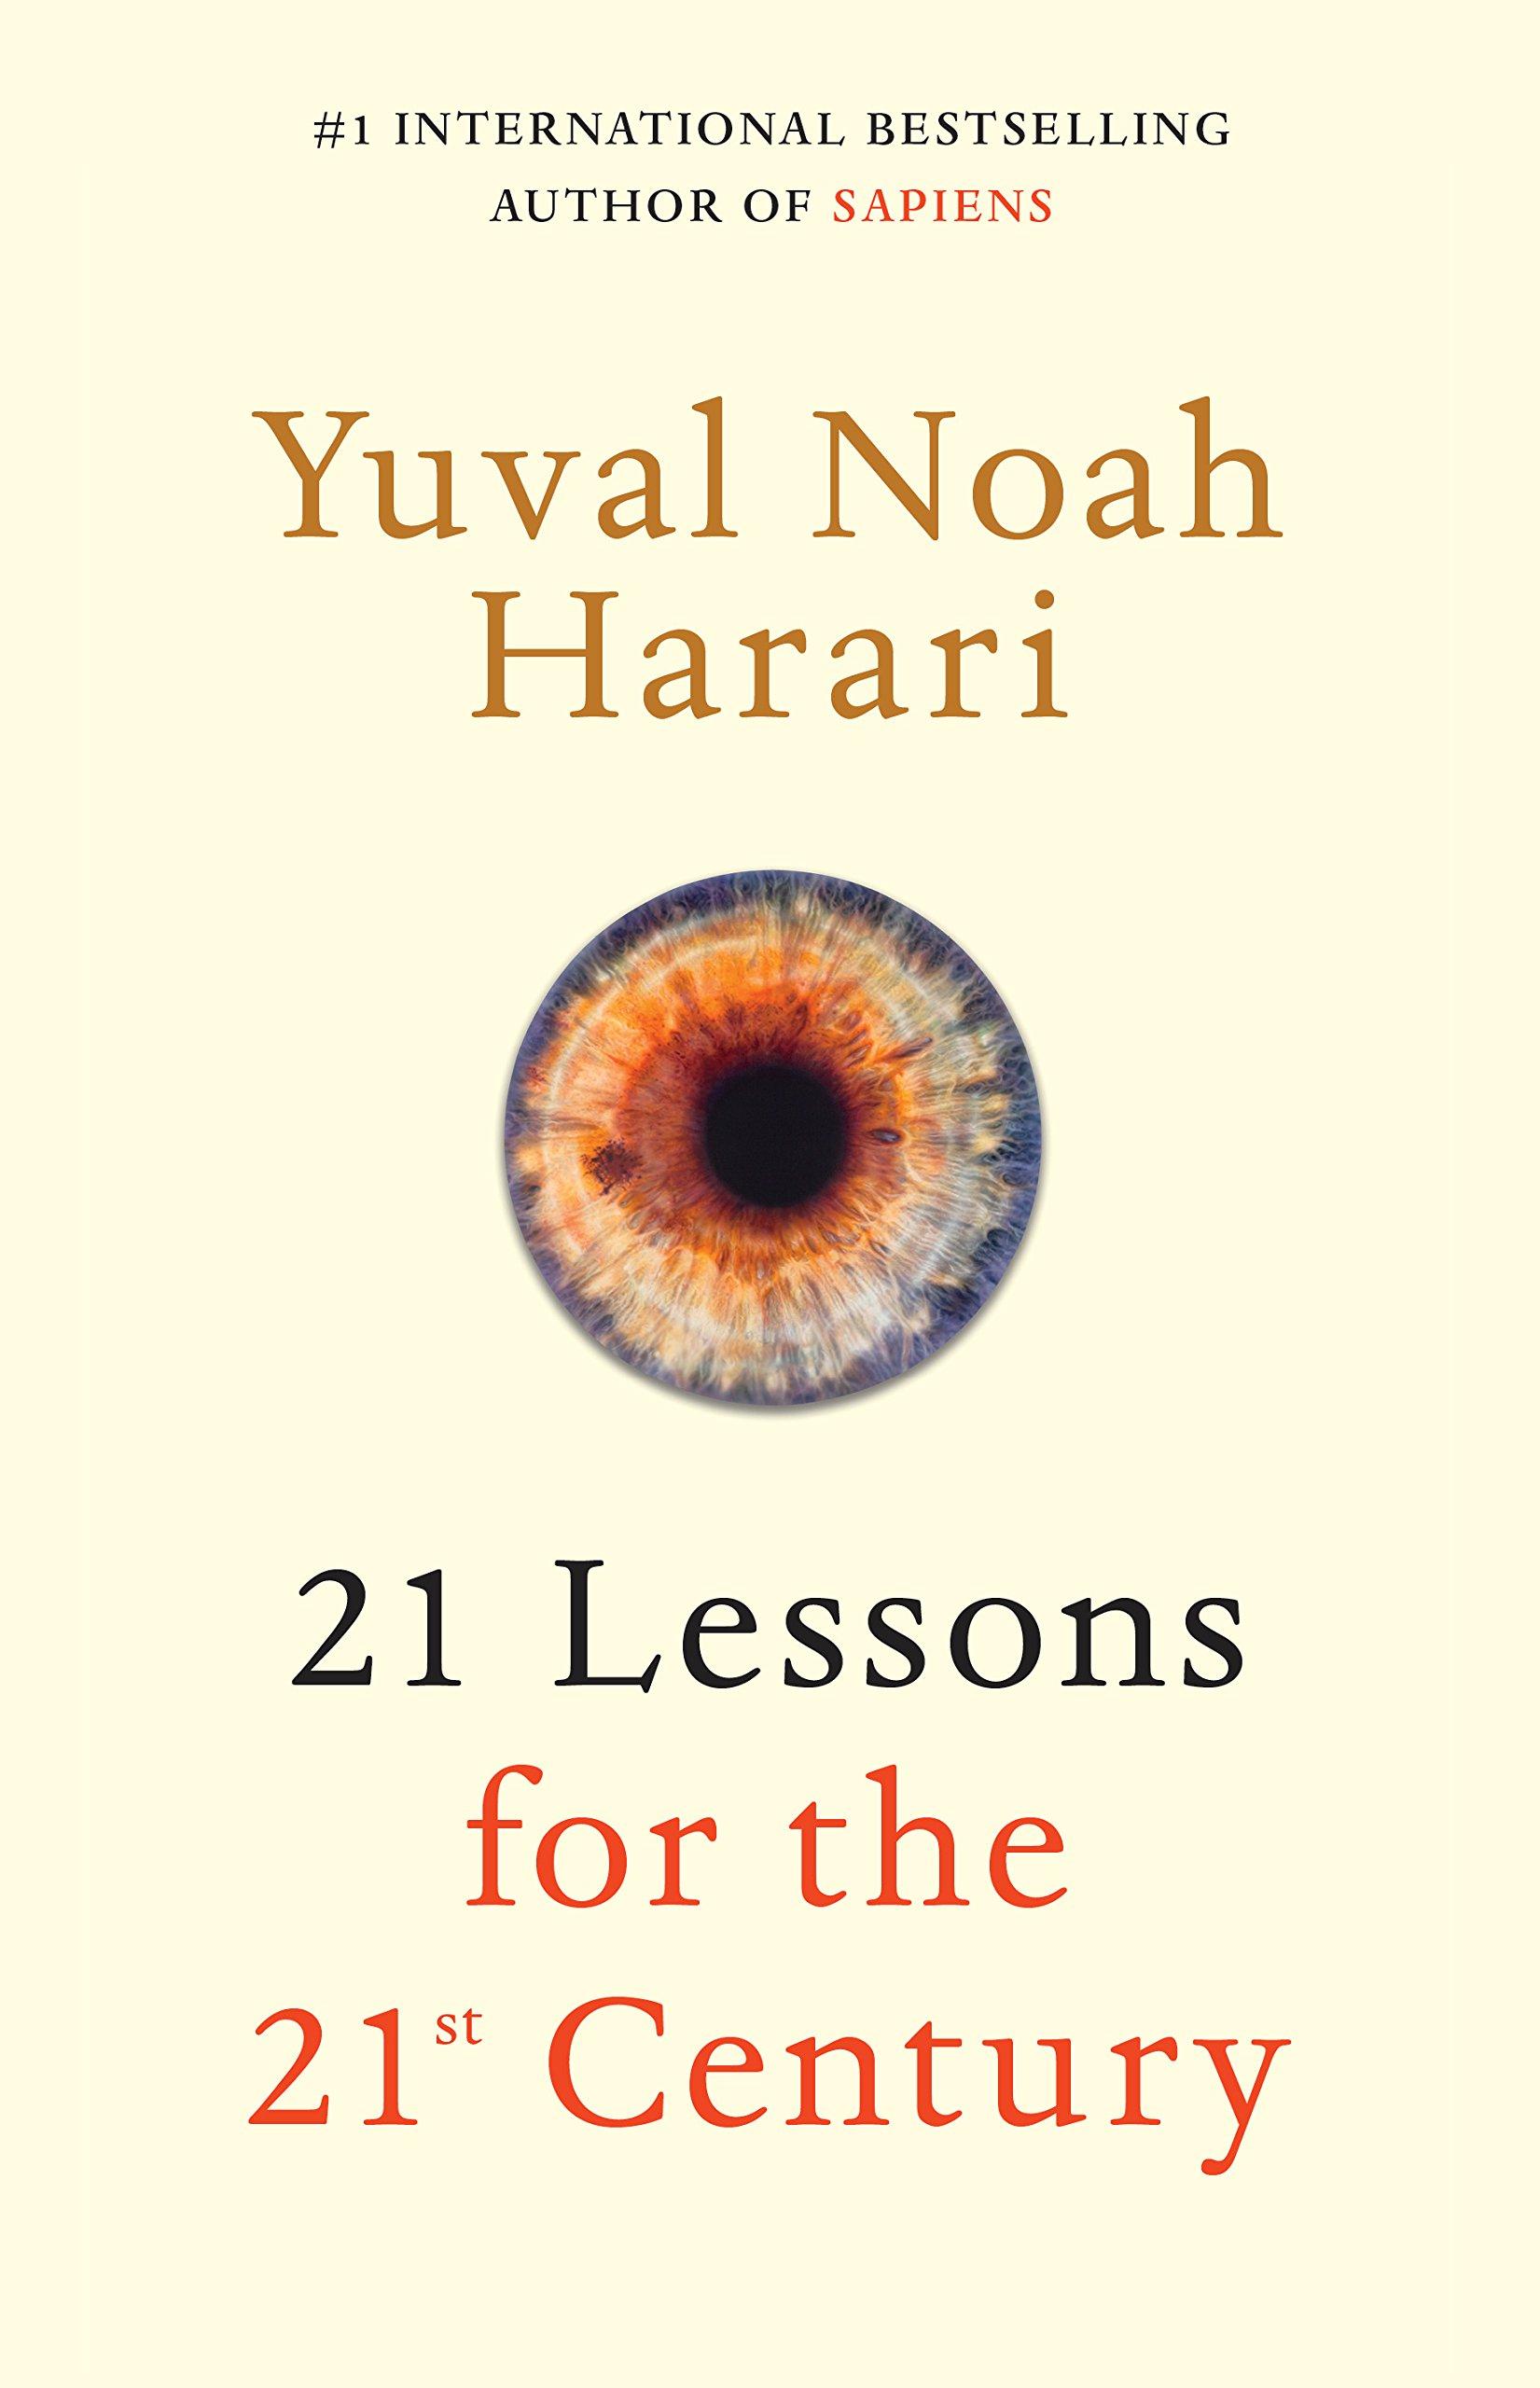 21 Lessons for the 21st Century: Harari, Yuval Noah: 9780771048852: Books - Amazon.ca